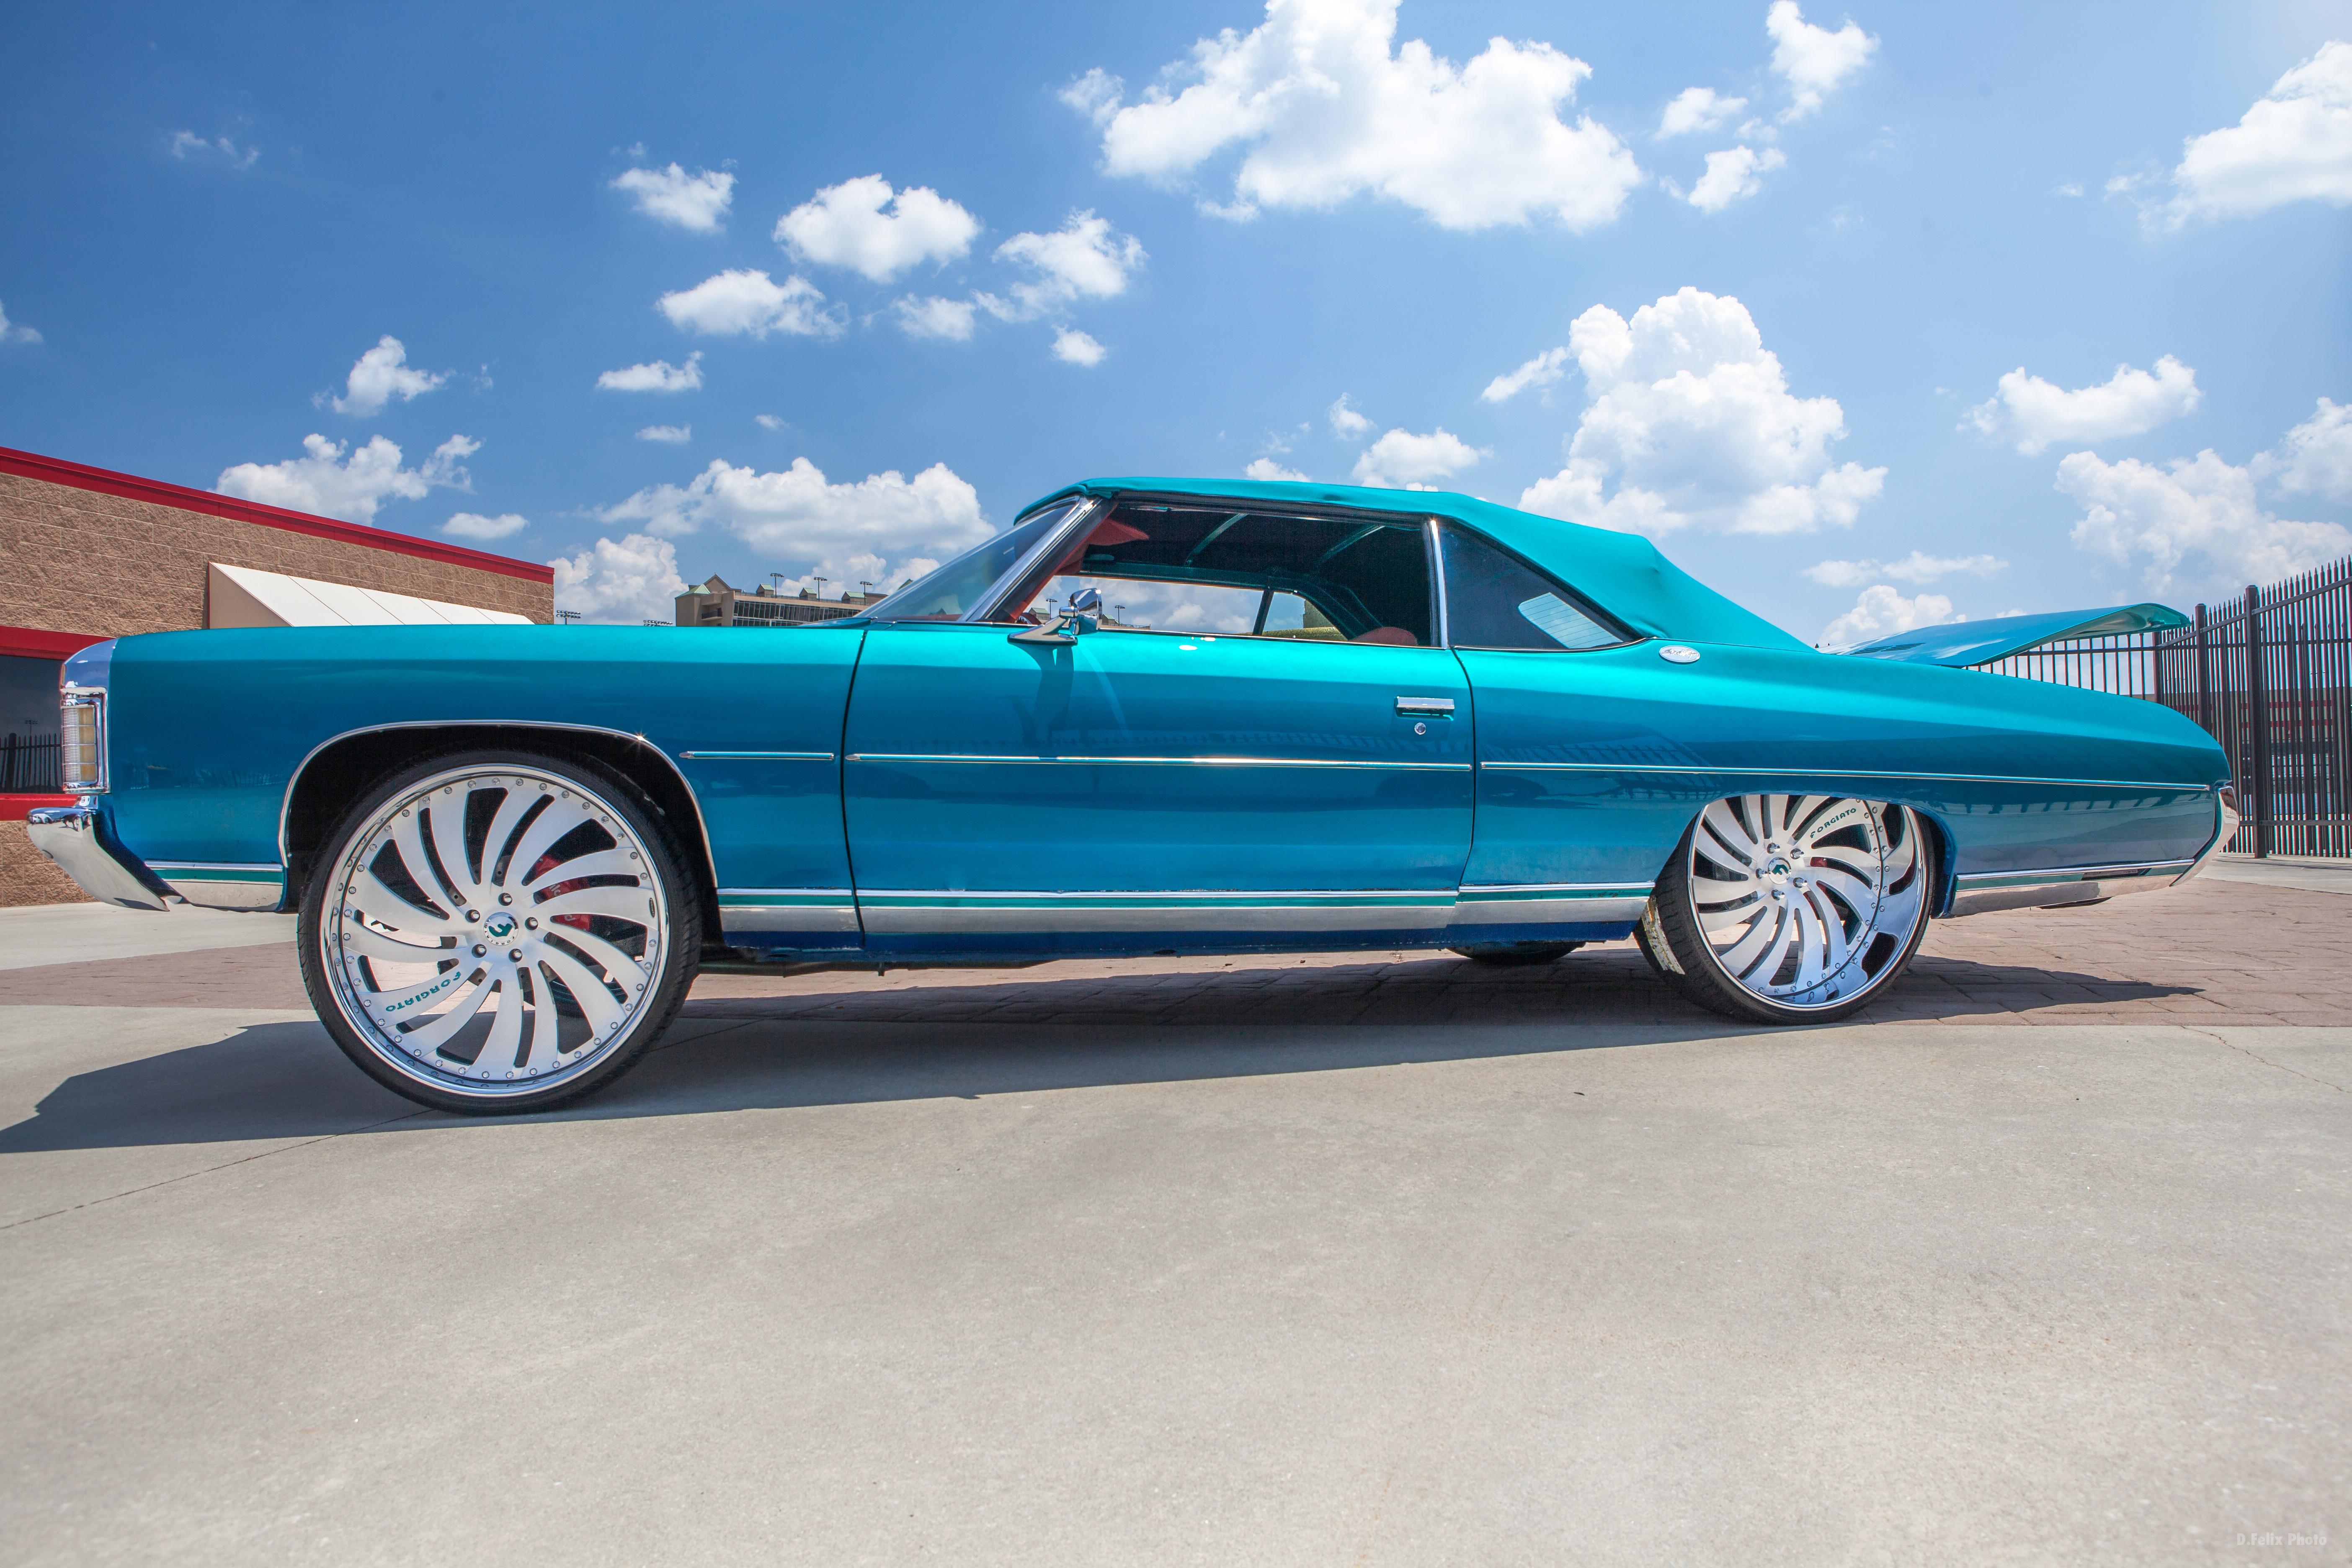 Atlanta Motor Speedway Rides Magazine - Car show atlanta motor speedway